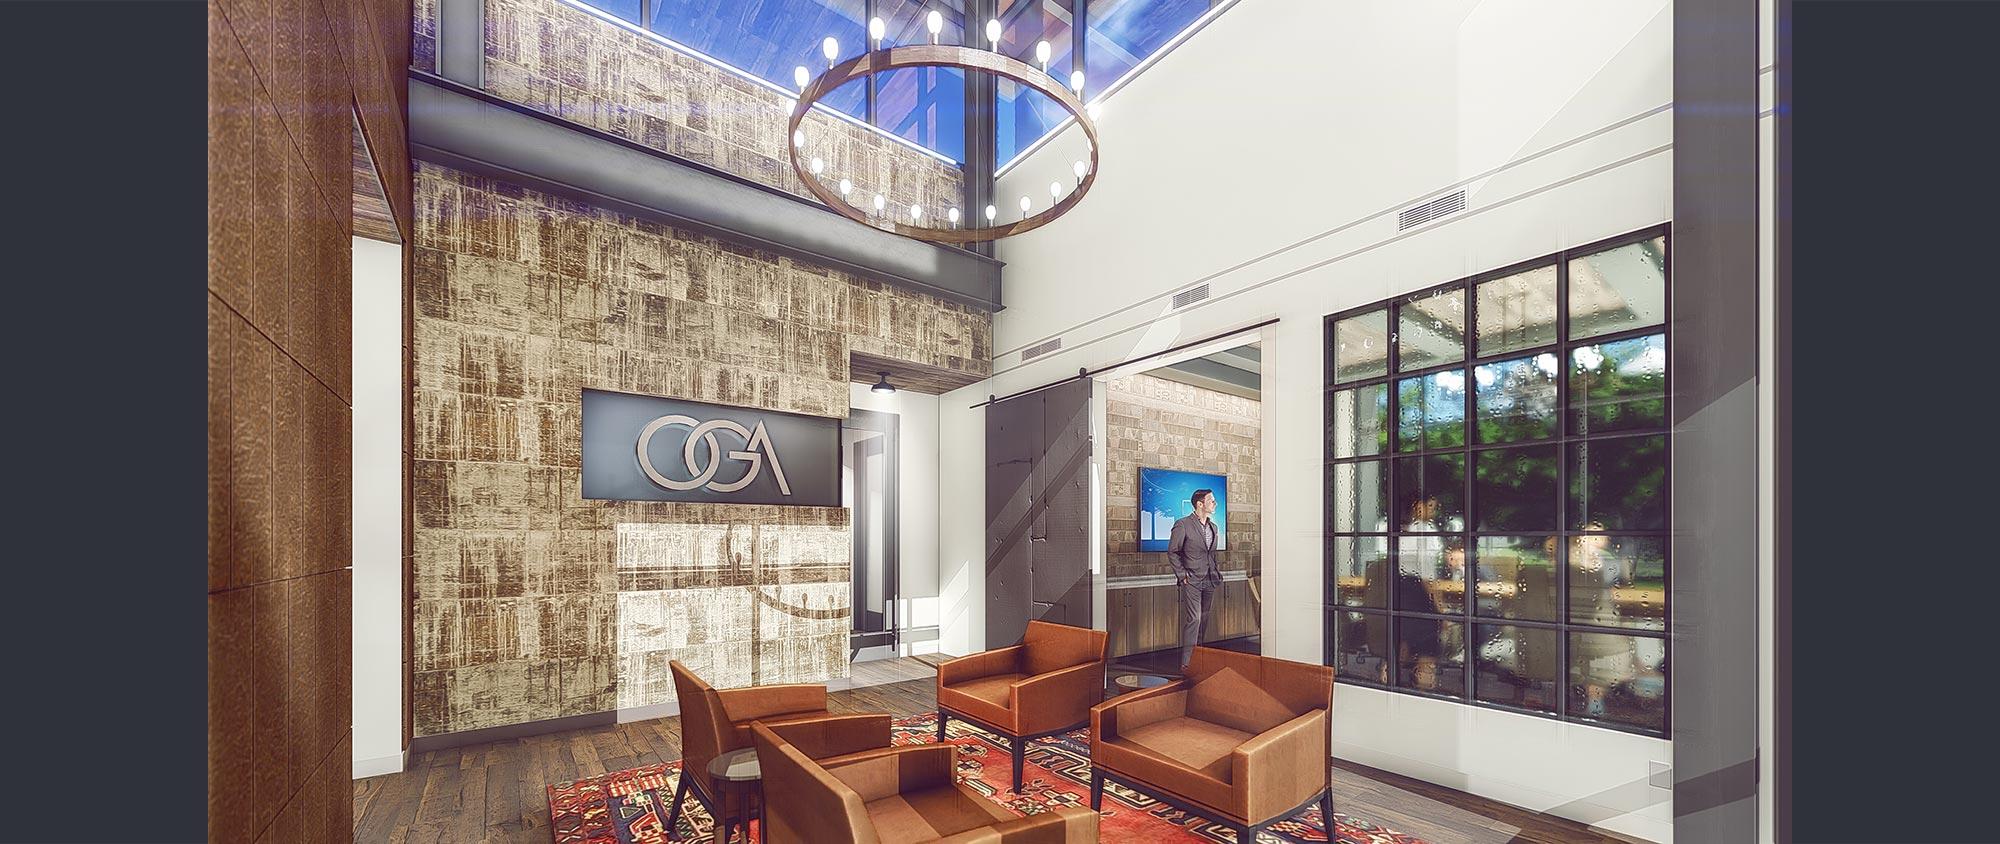 OGA Office Building